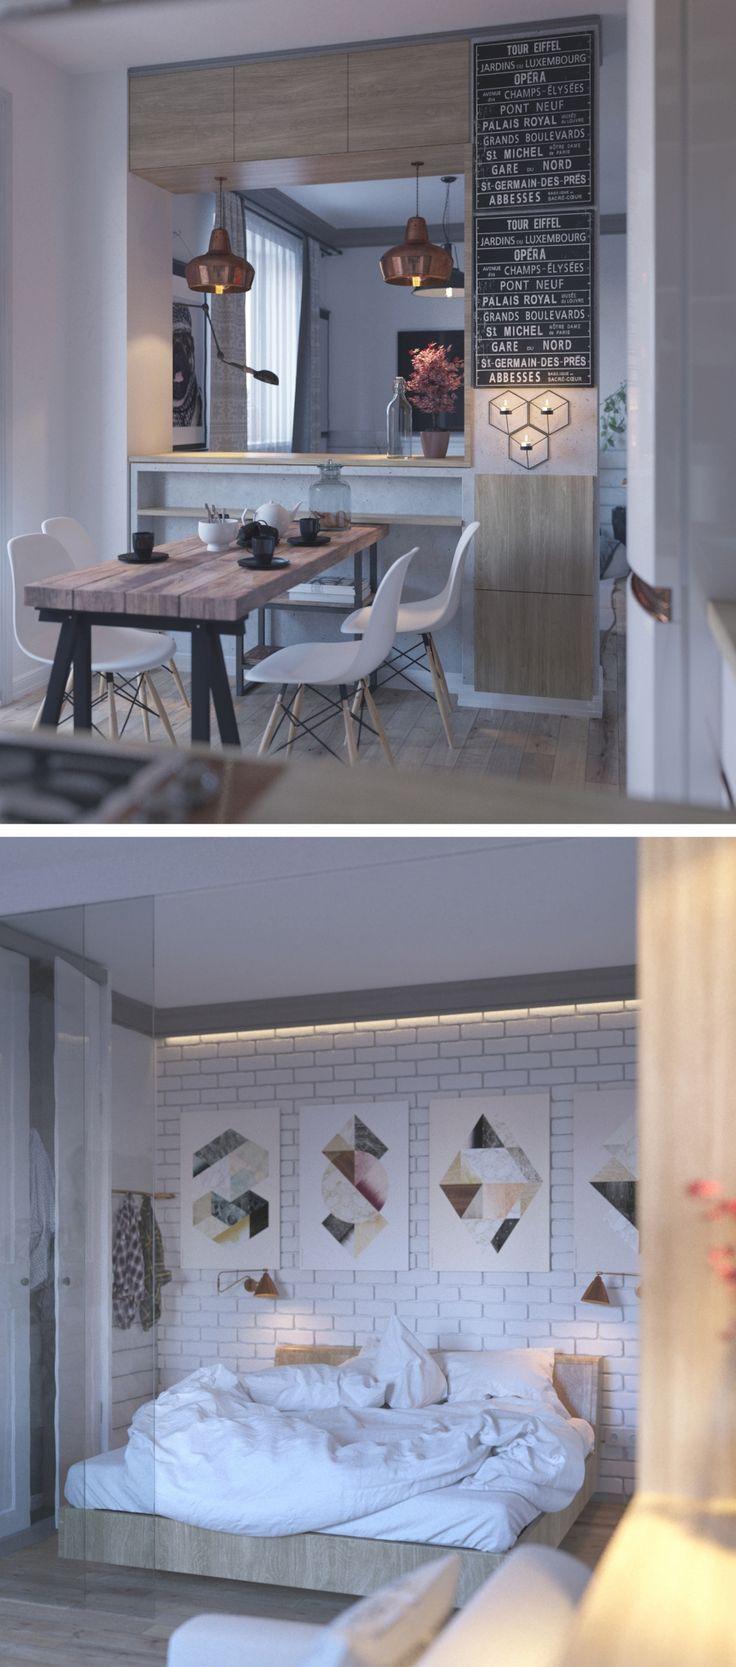 Scandinavian interior - Галерея 3ddd.ru